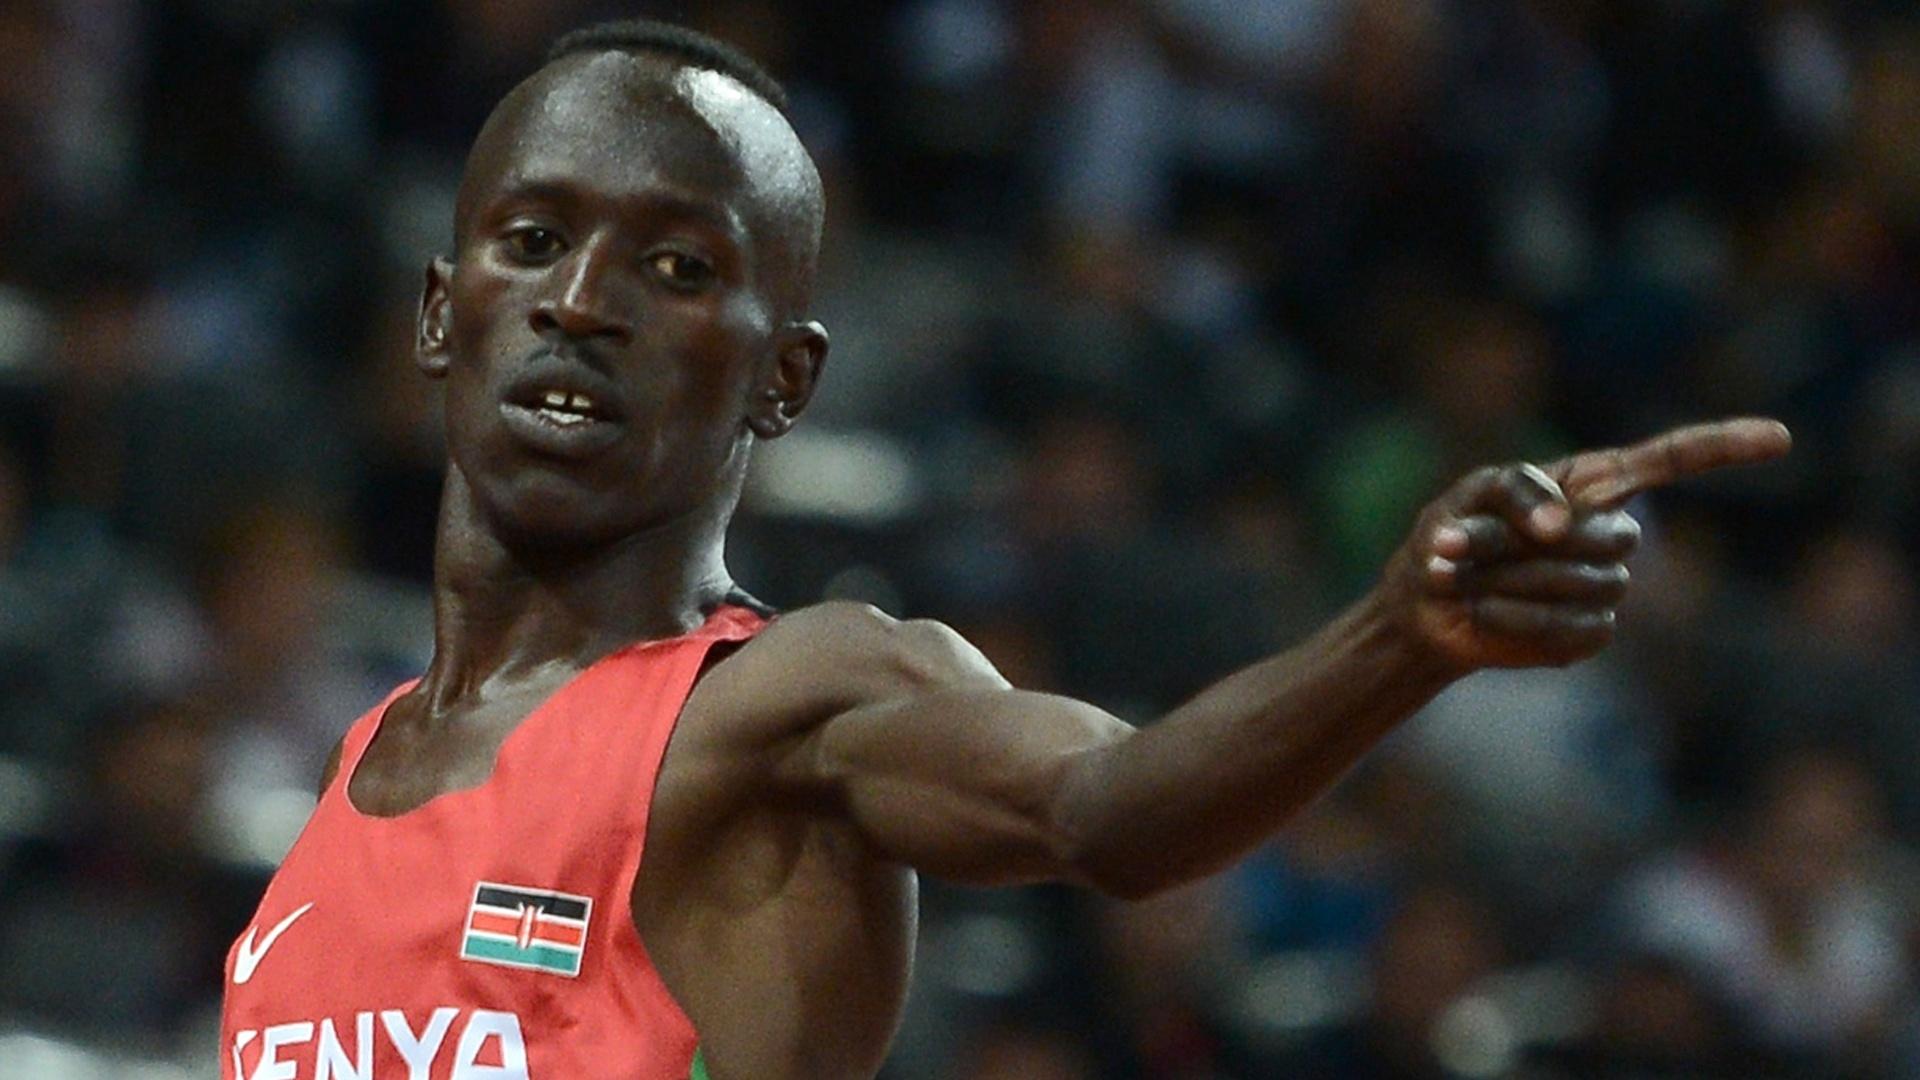 queniano ezekiel kemboi comemora apos vencer Homepage - Newsmag